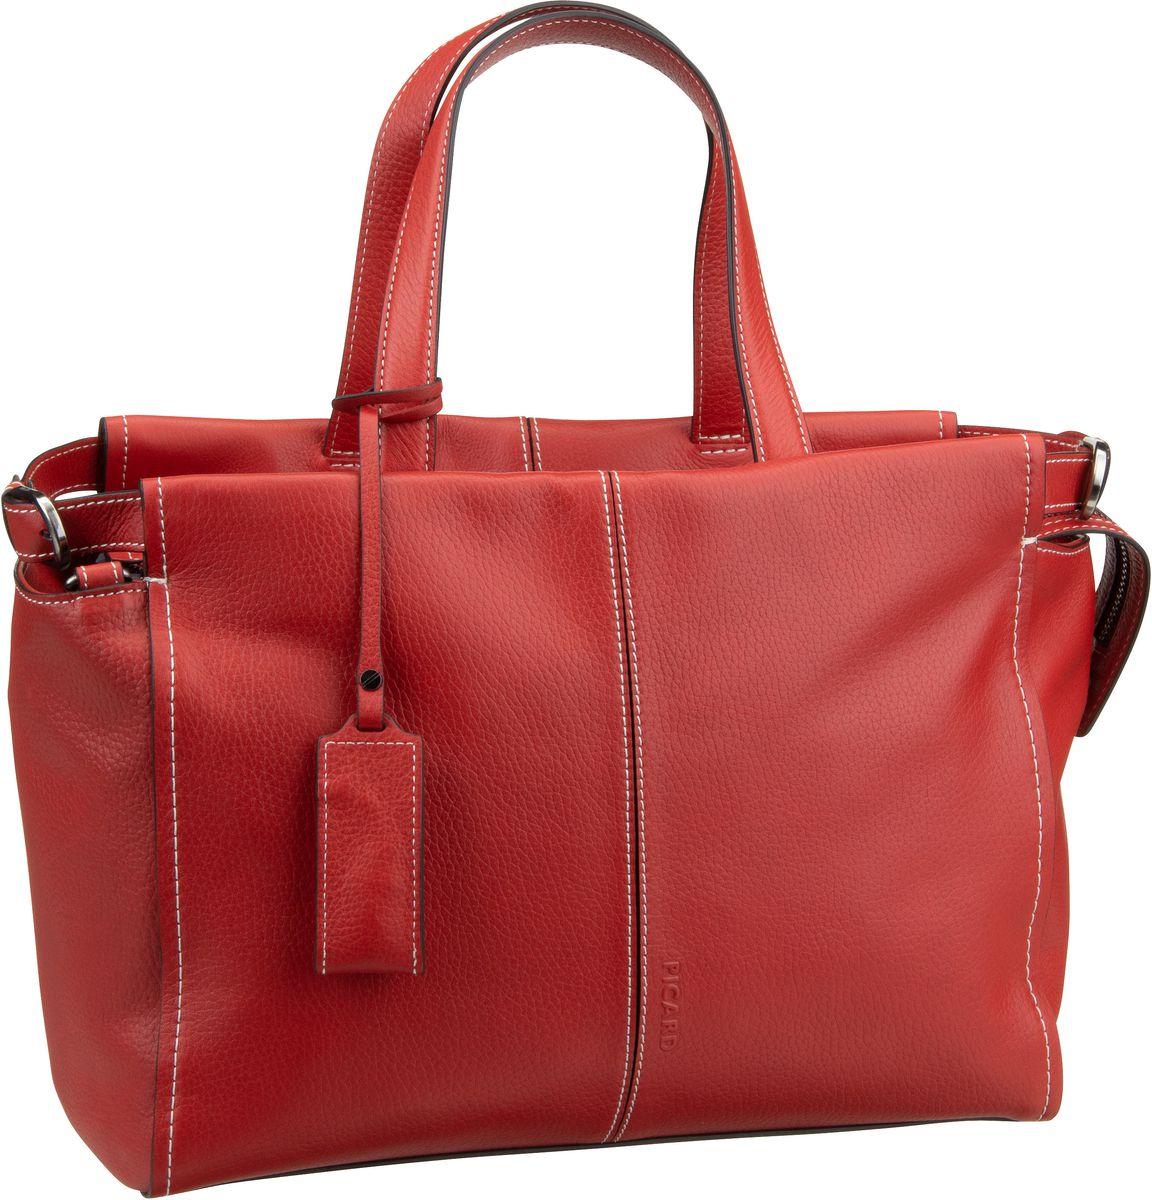 Picard Handtasche Enjoy 9362 Amore